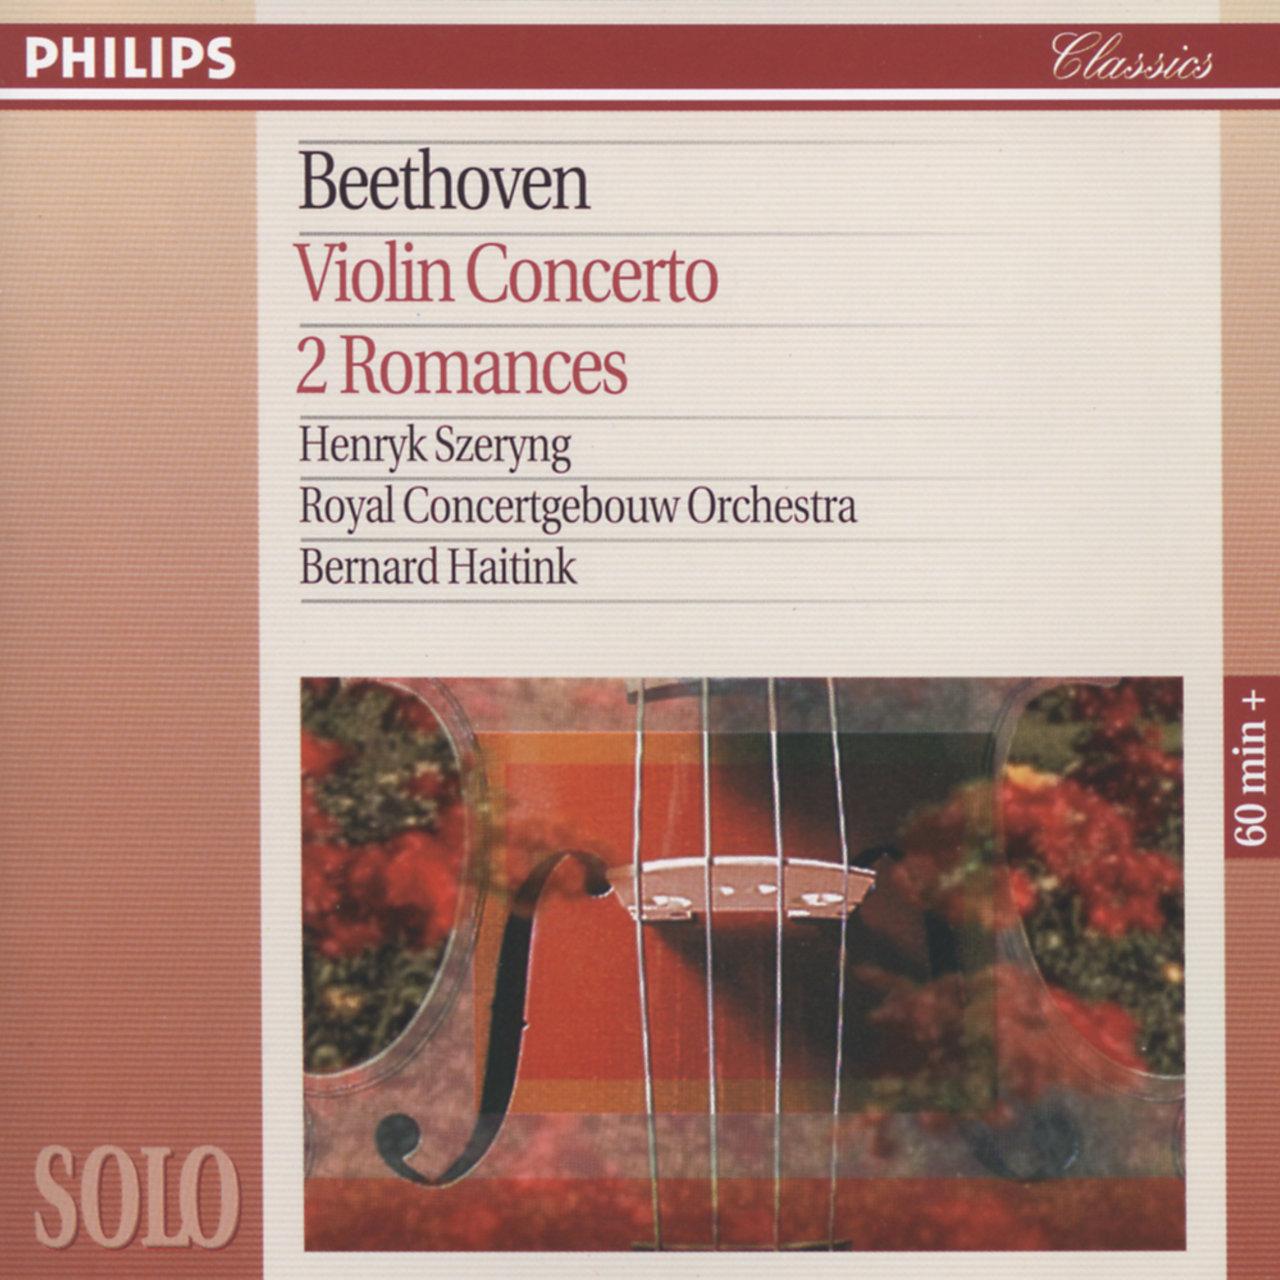 Beethoven: Violin Concerto / Romances